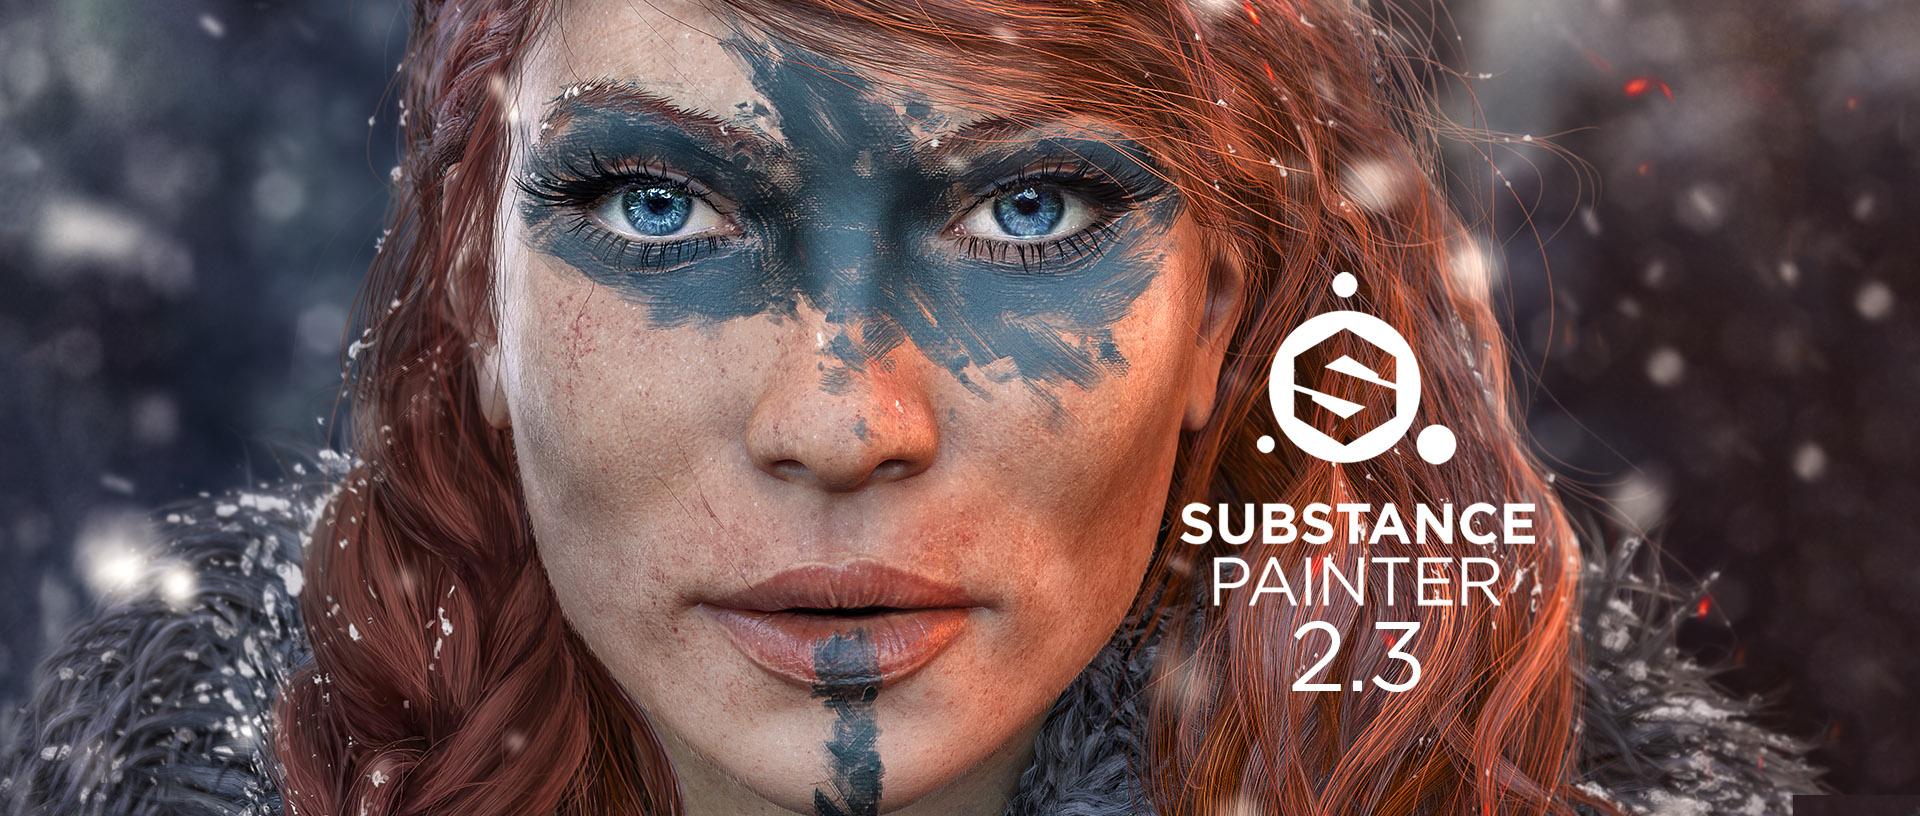 Substance Painter 2.3 adds Photoshop Export